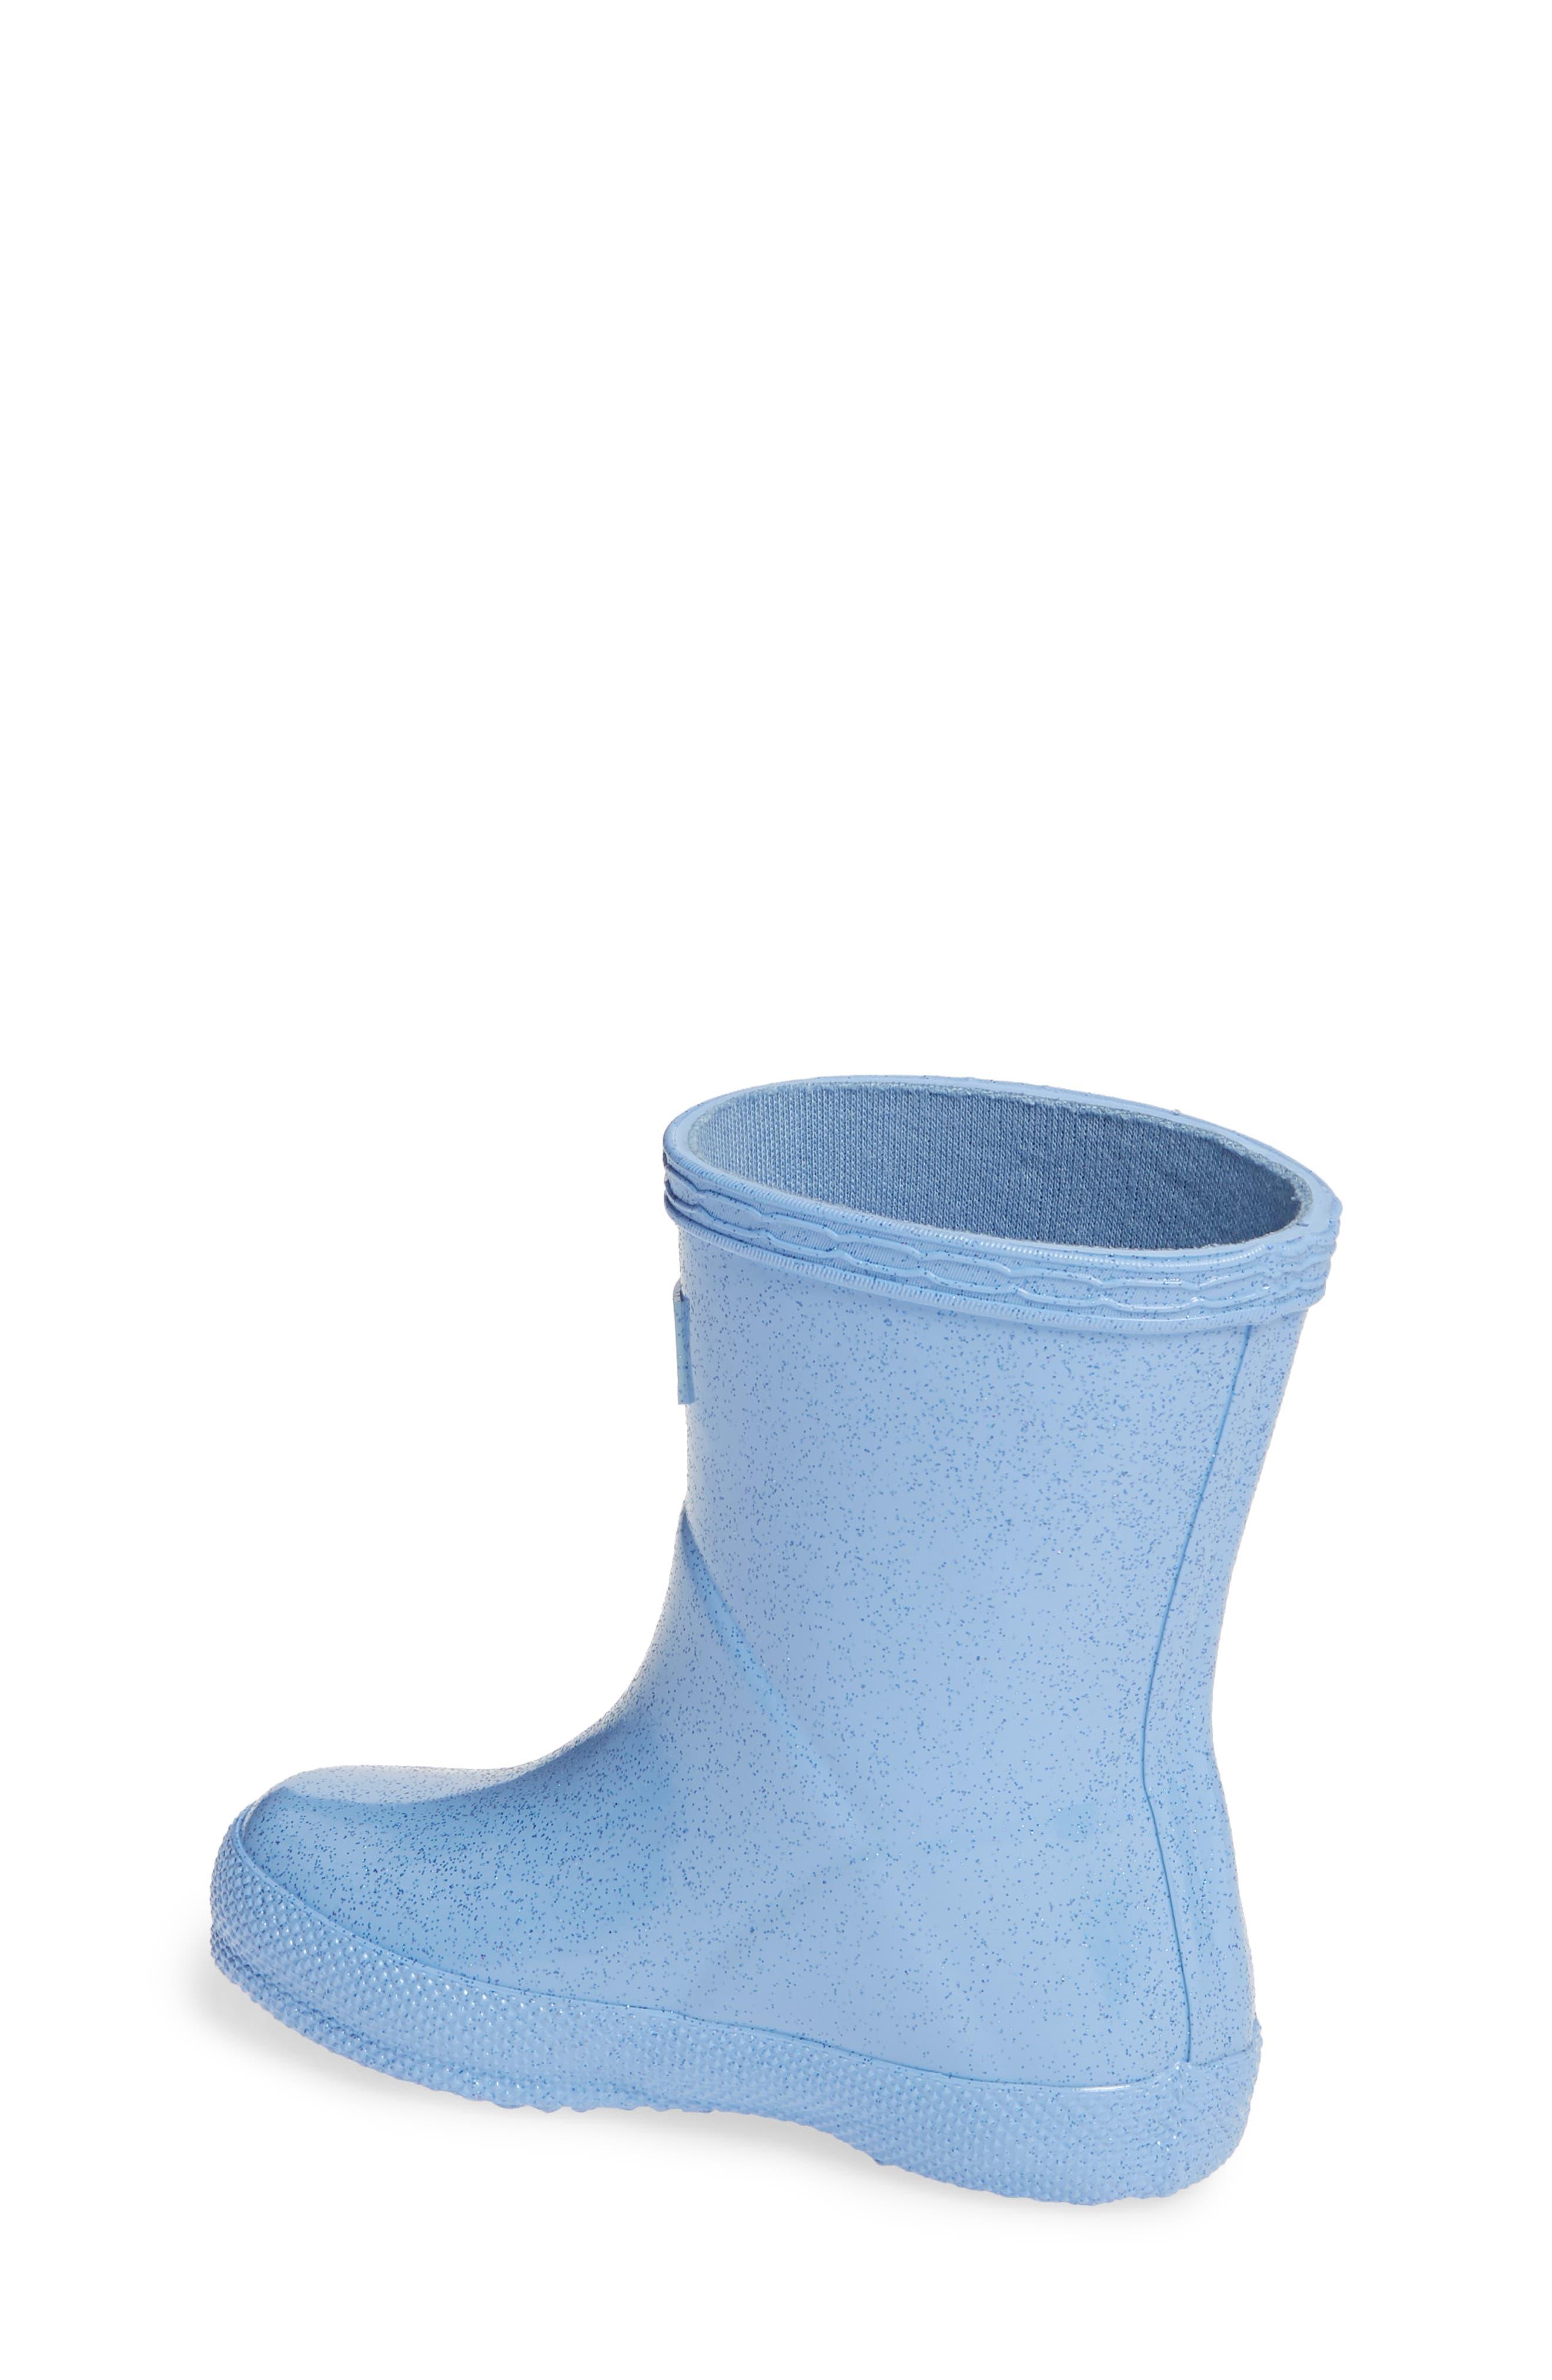 Kids First Classic Starcloud Glitter Rain Boot,                             Alternate thumbnail 2, color,                             VIVID BLUE